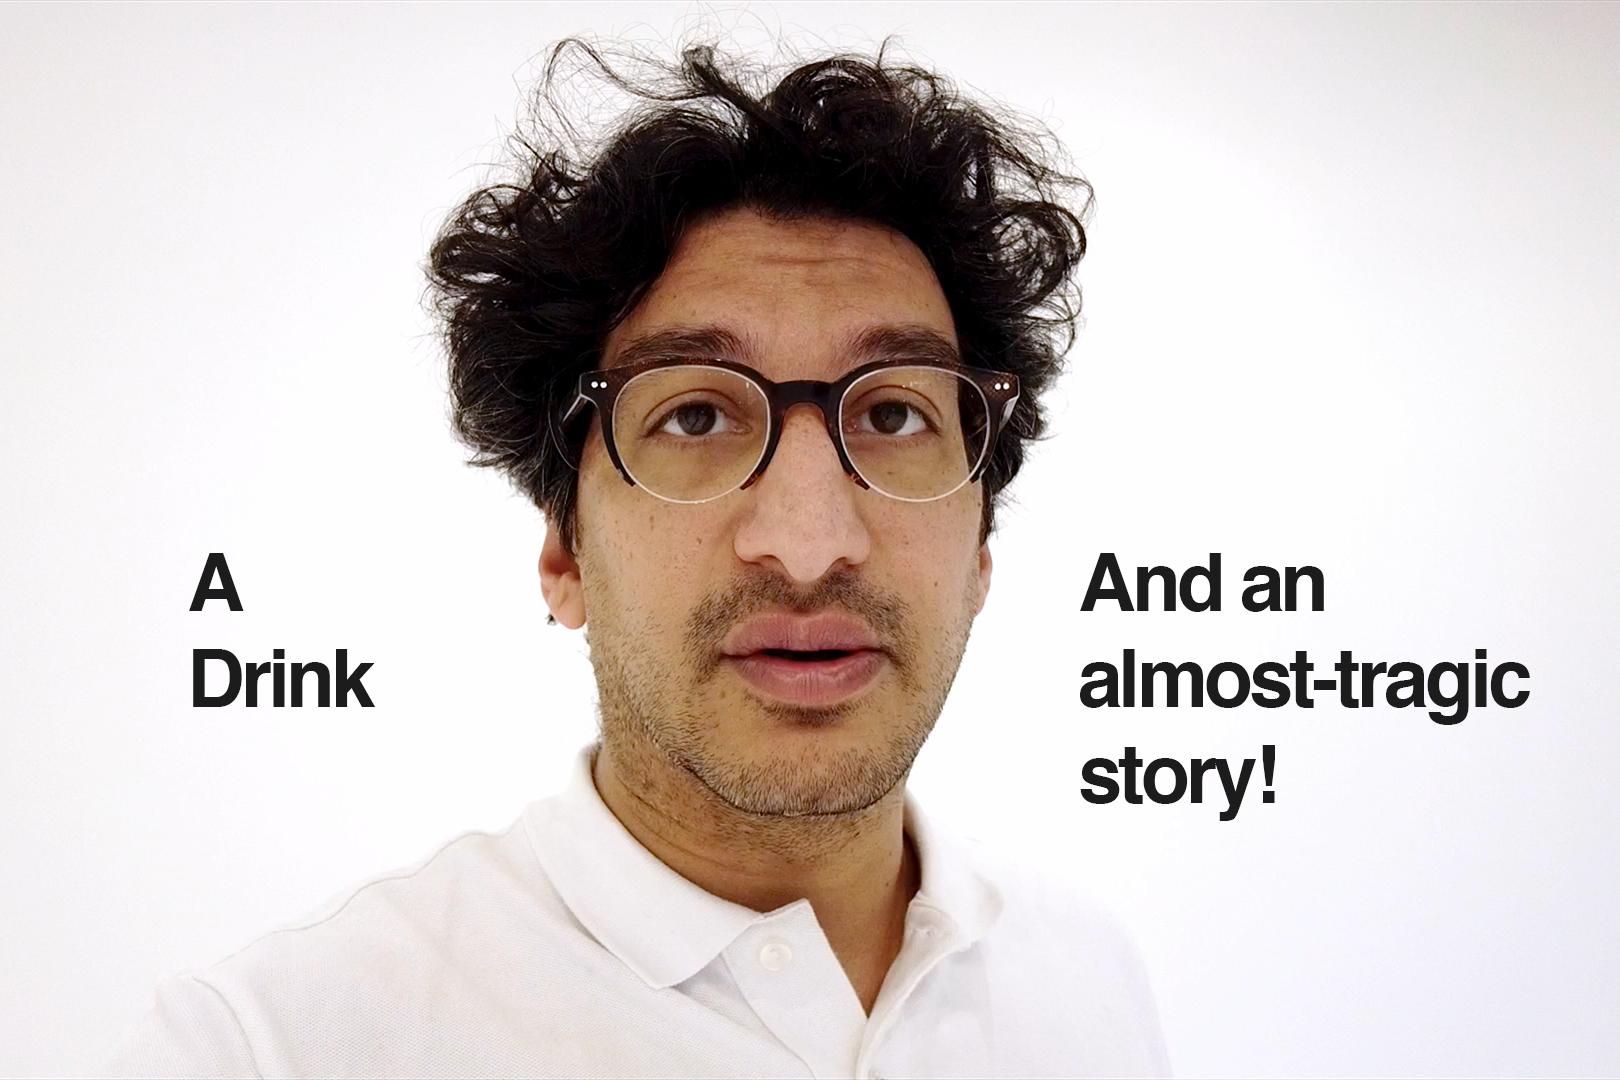 StartWell Founder Vlog #4